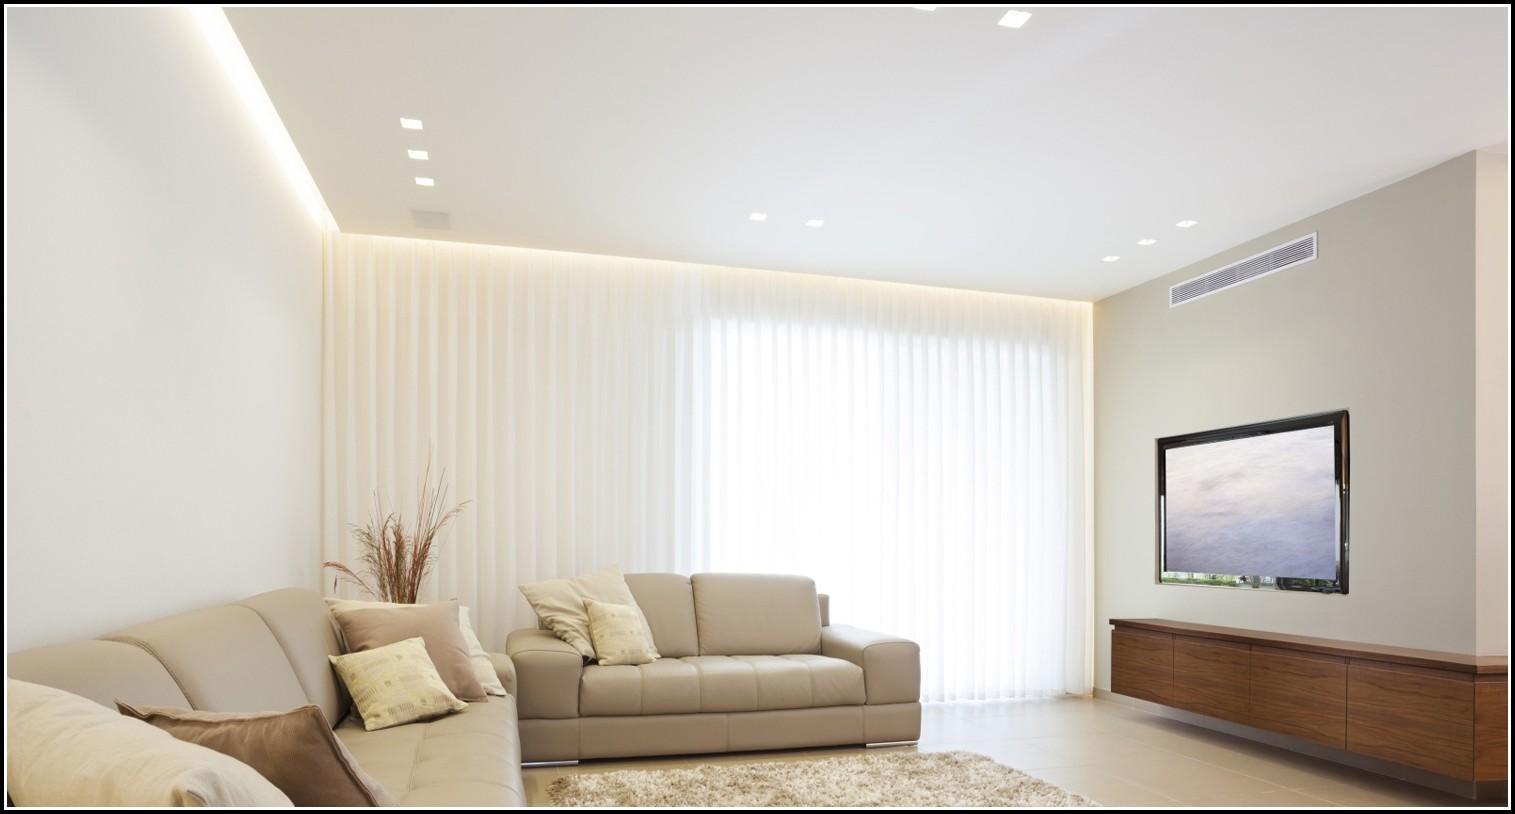 Indirekte Beleuchtung Decke Abhängen